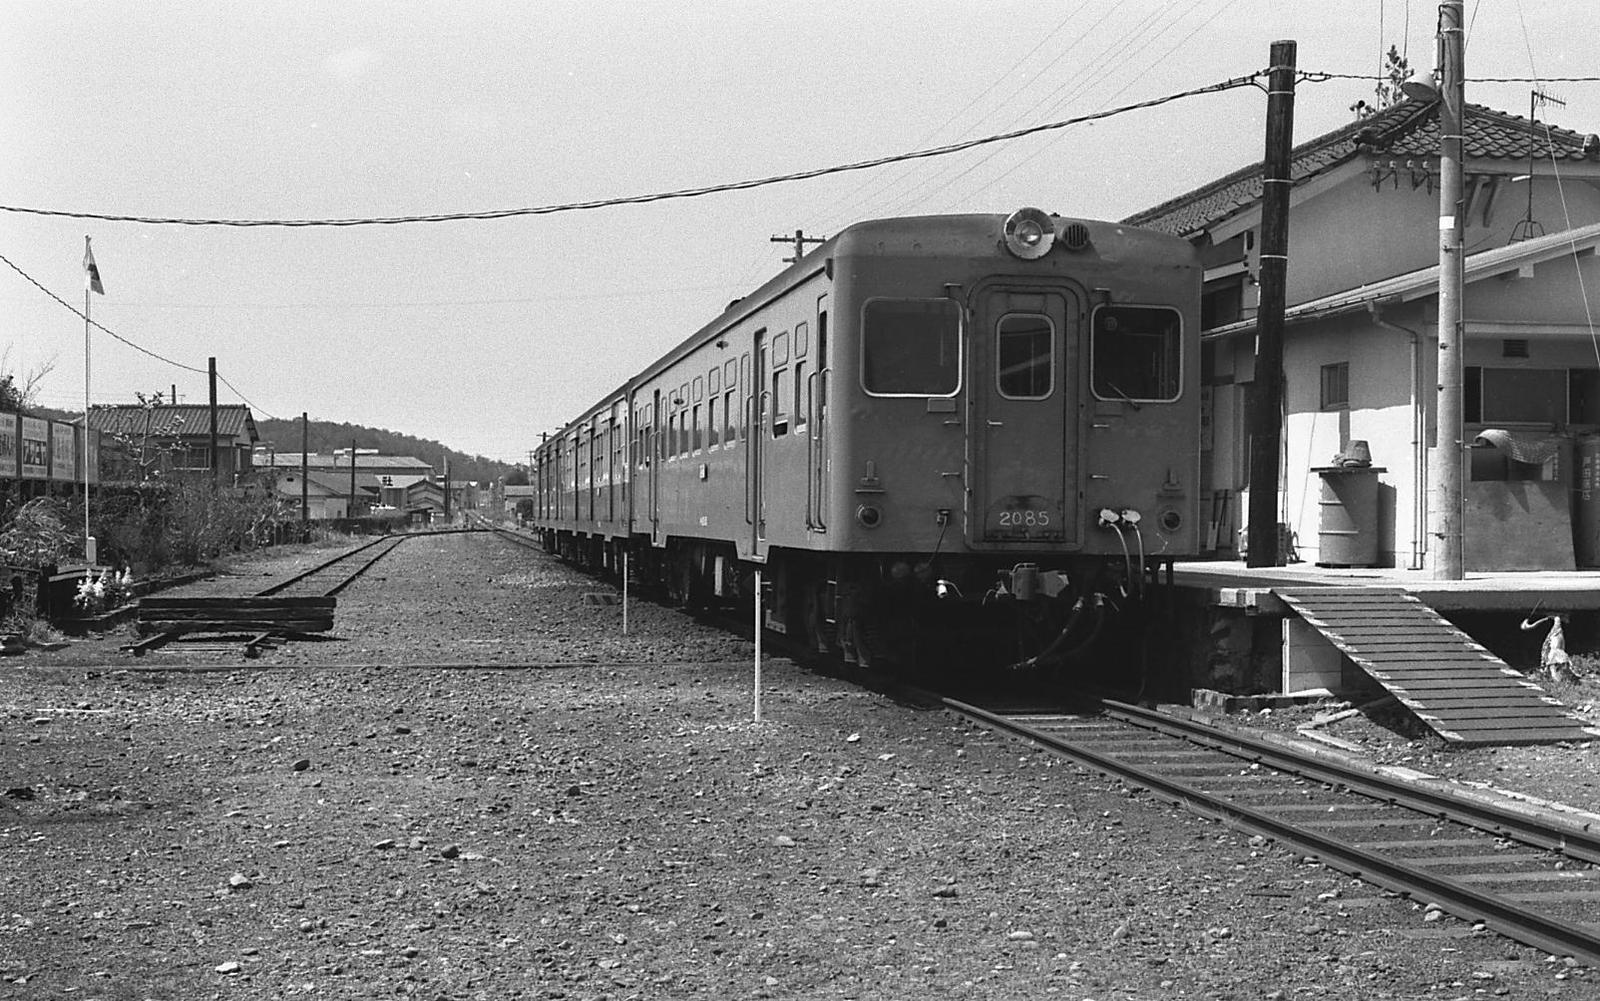 19800408c02